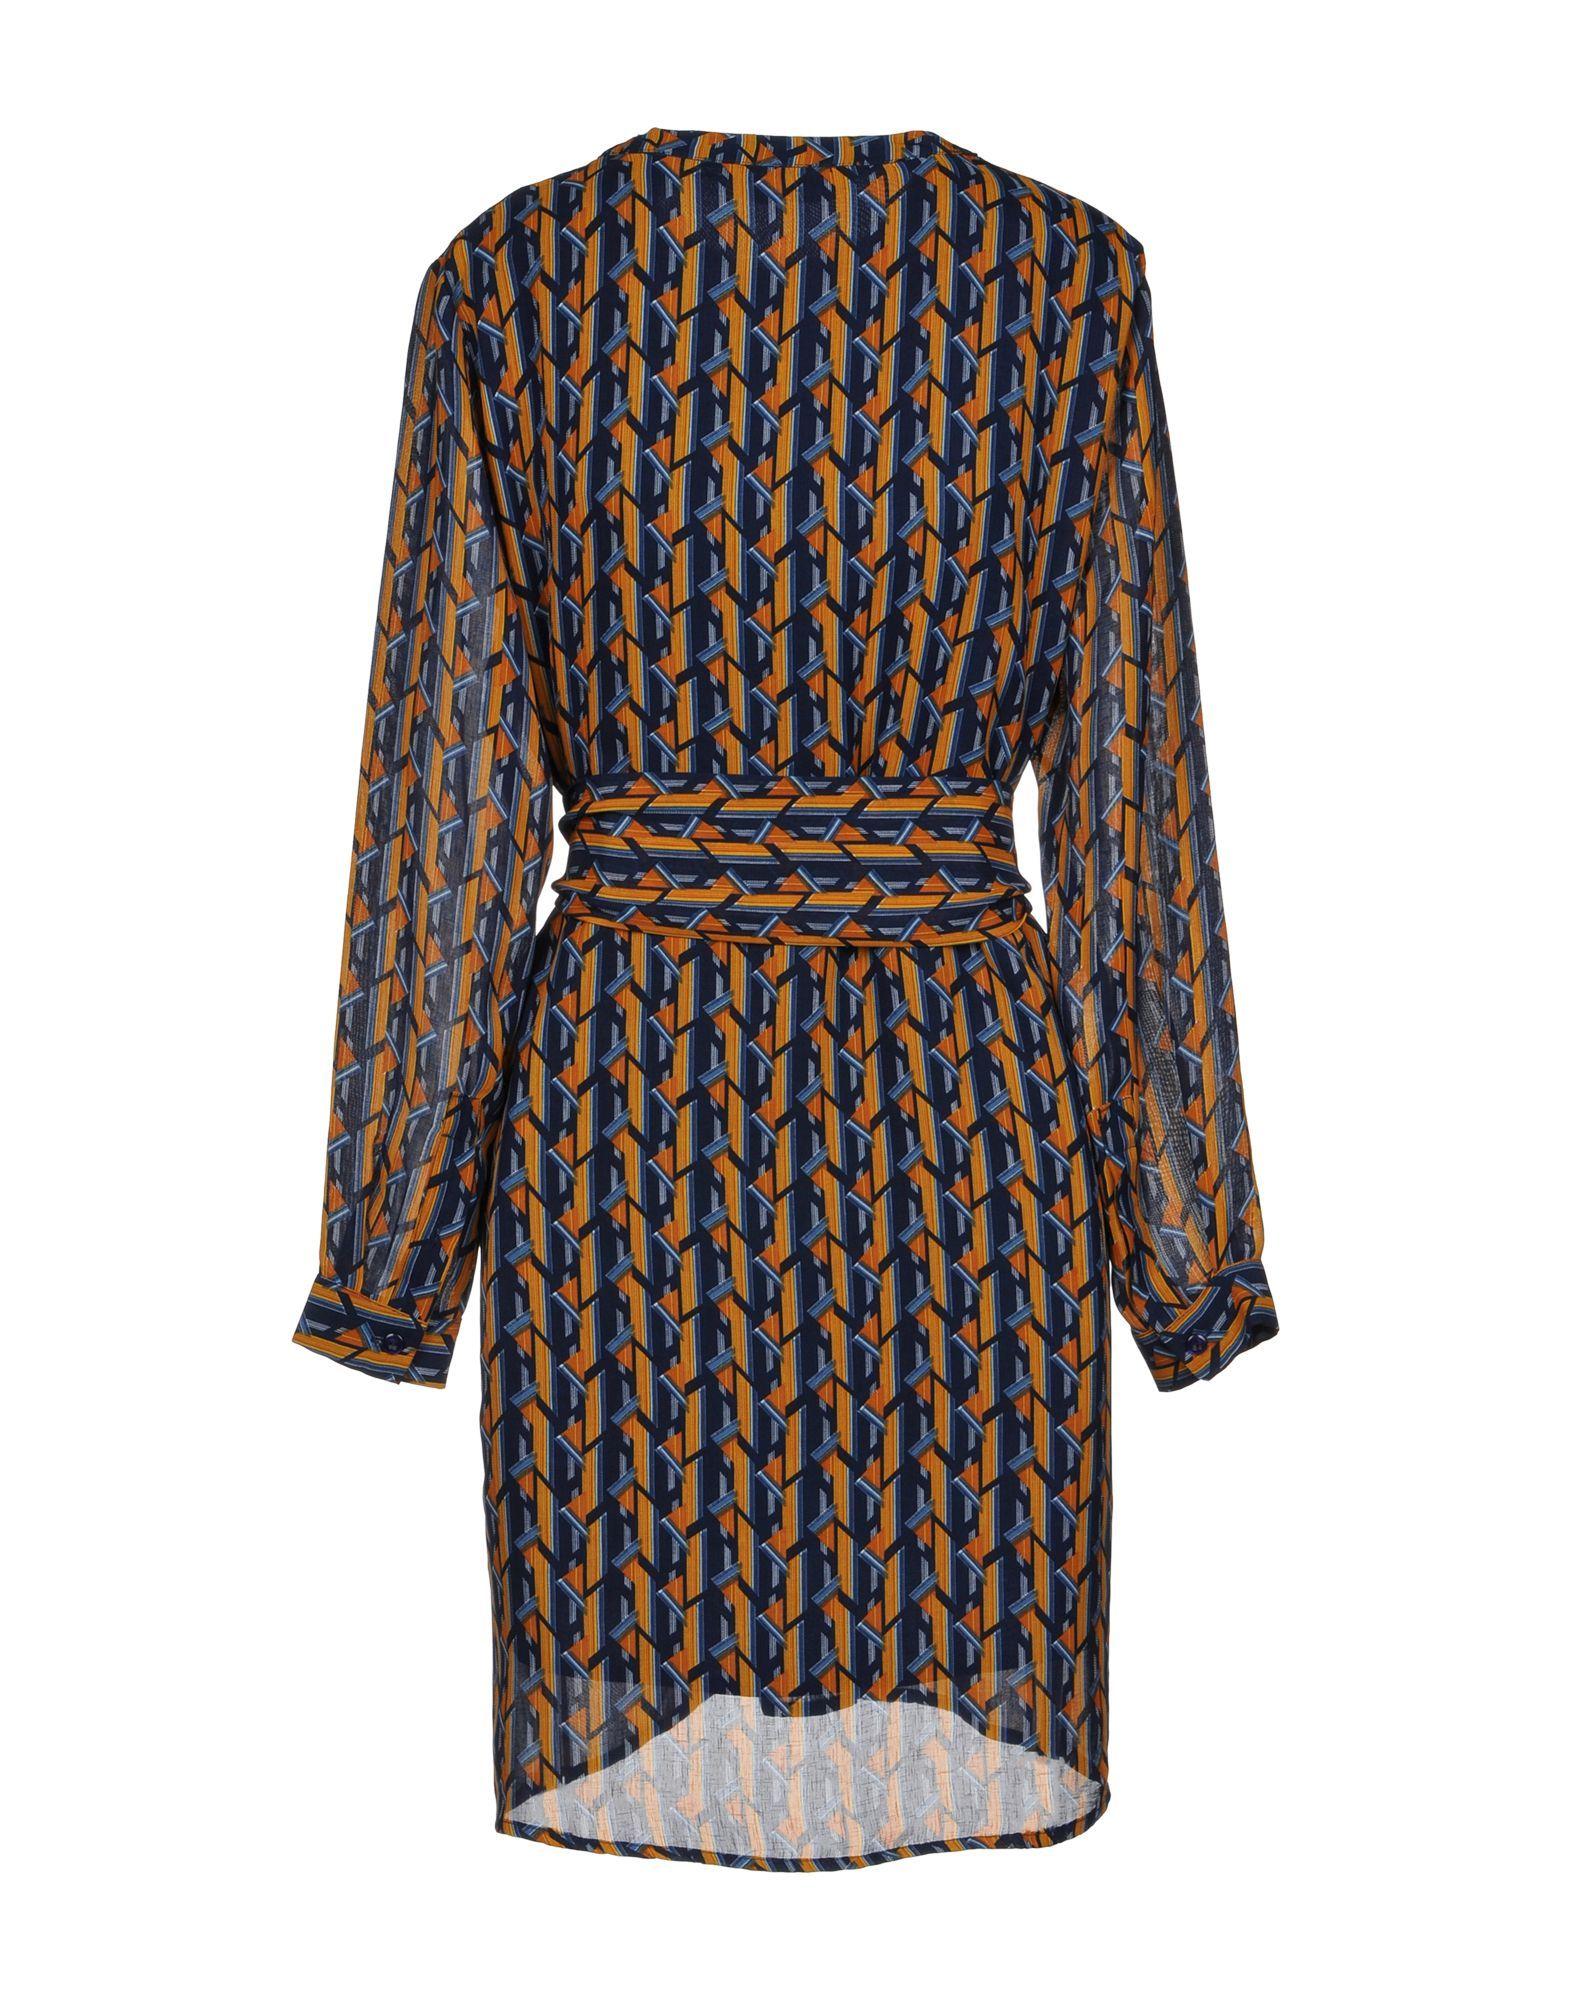 Anonyme Designers Dark Blue Print Crepe Dress